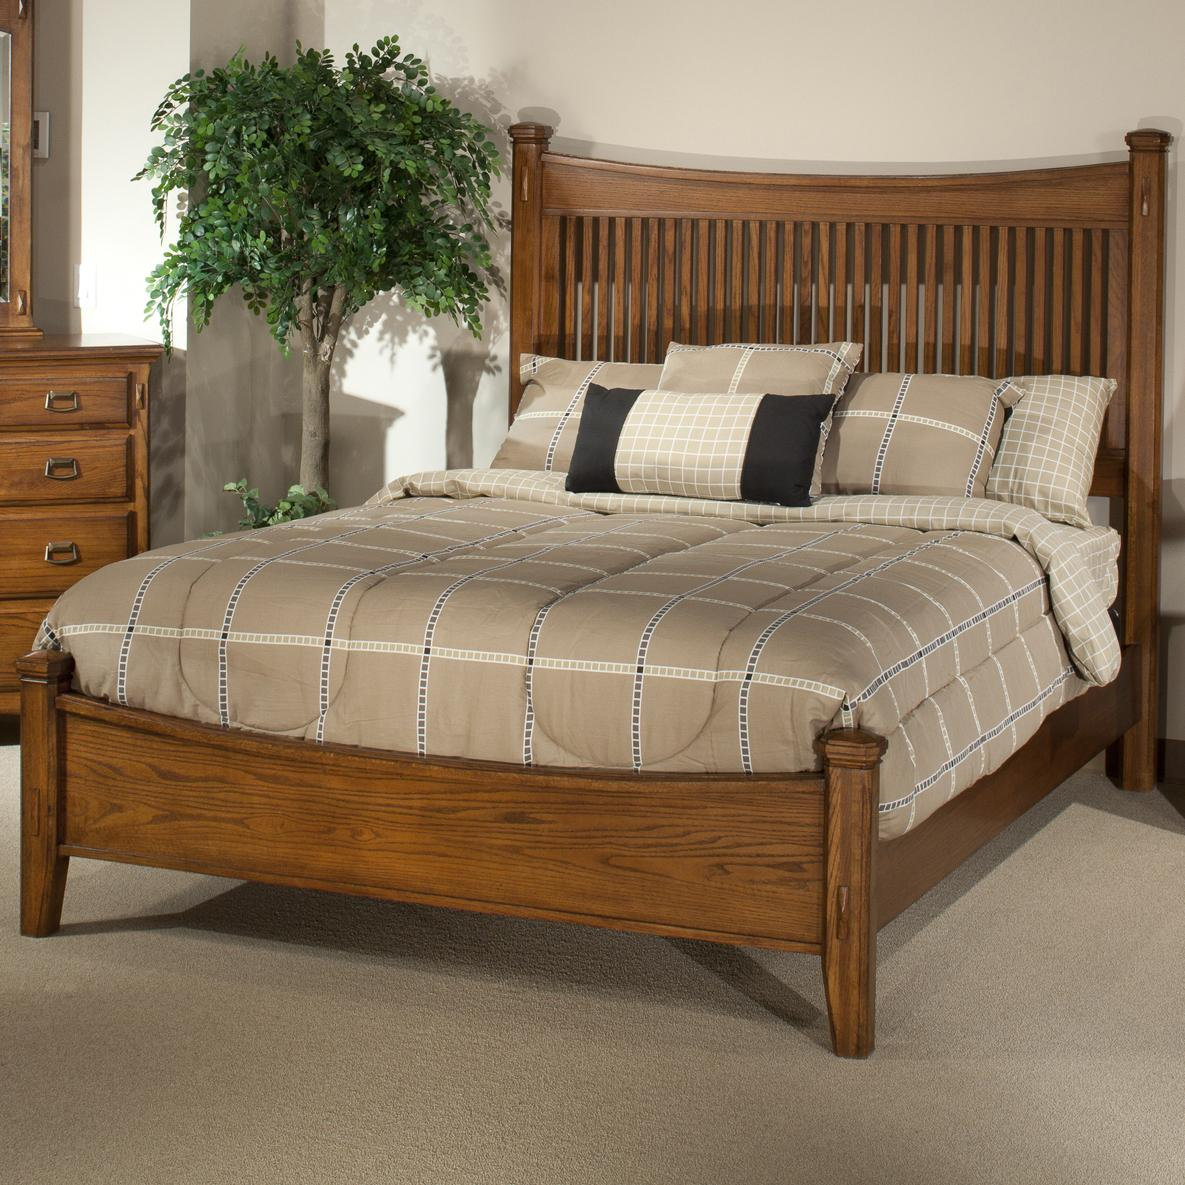 Intercon Pasadena Revival  Queen Bed - Item Number: PR-BR-5450Q-MBN- FB+HB+RS